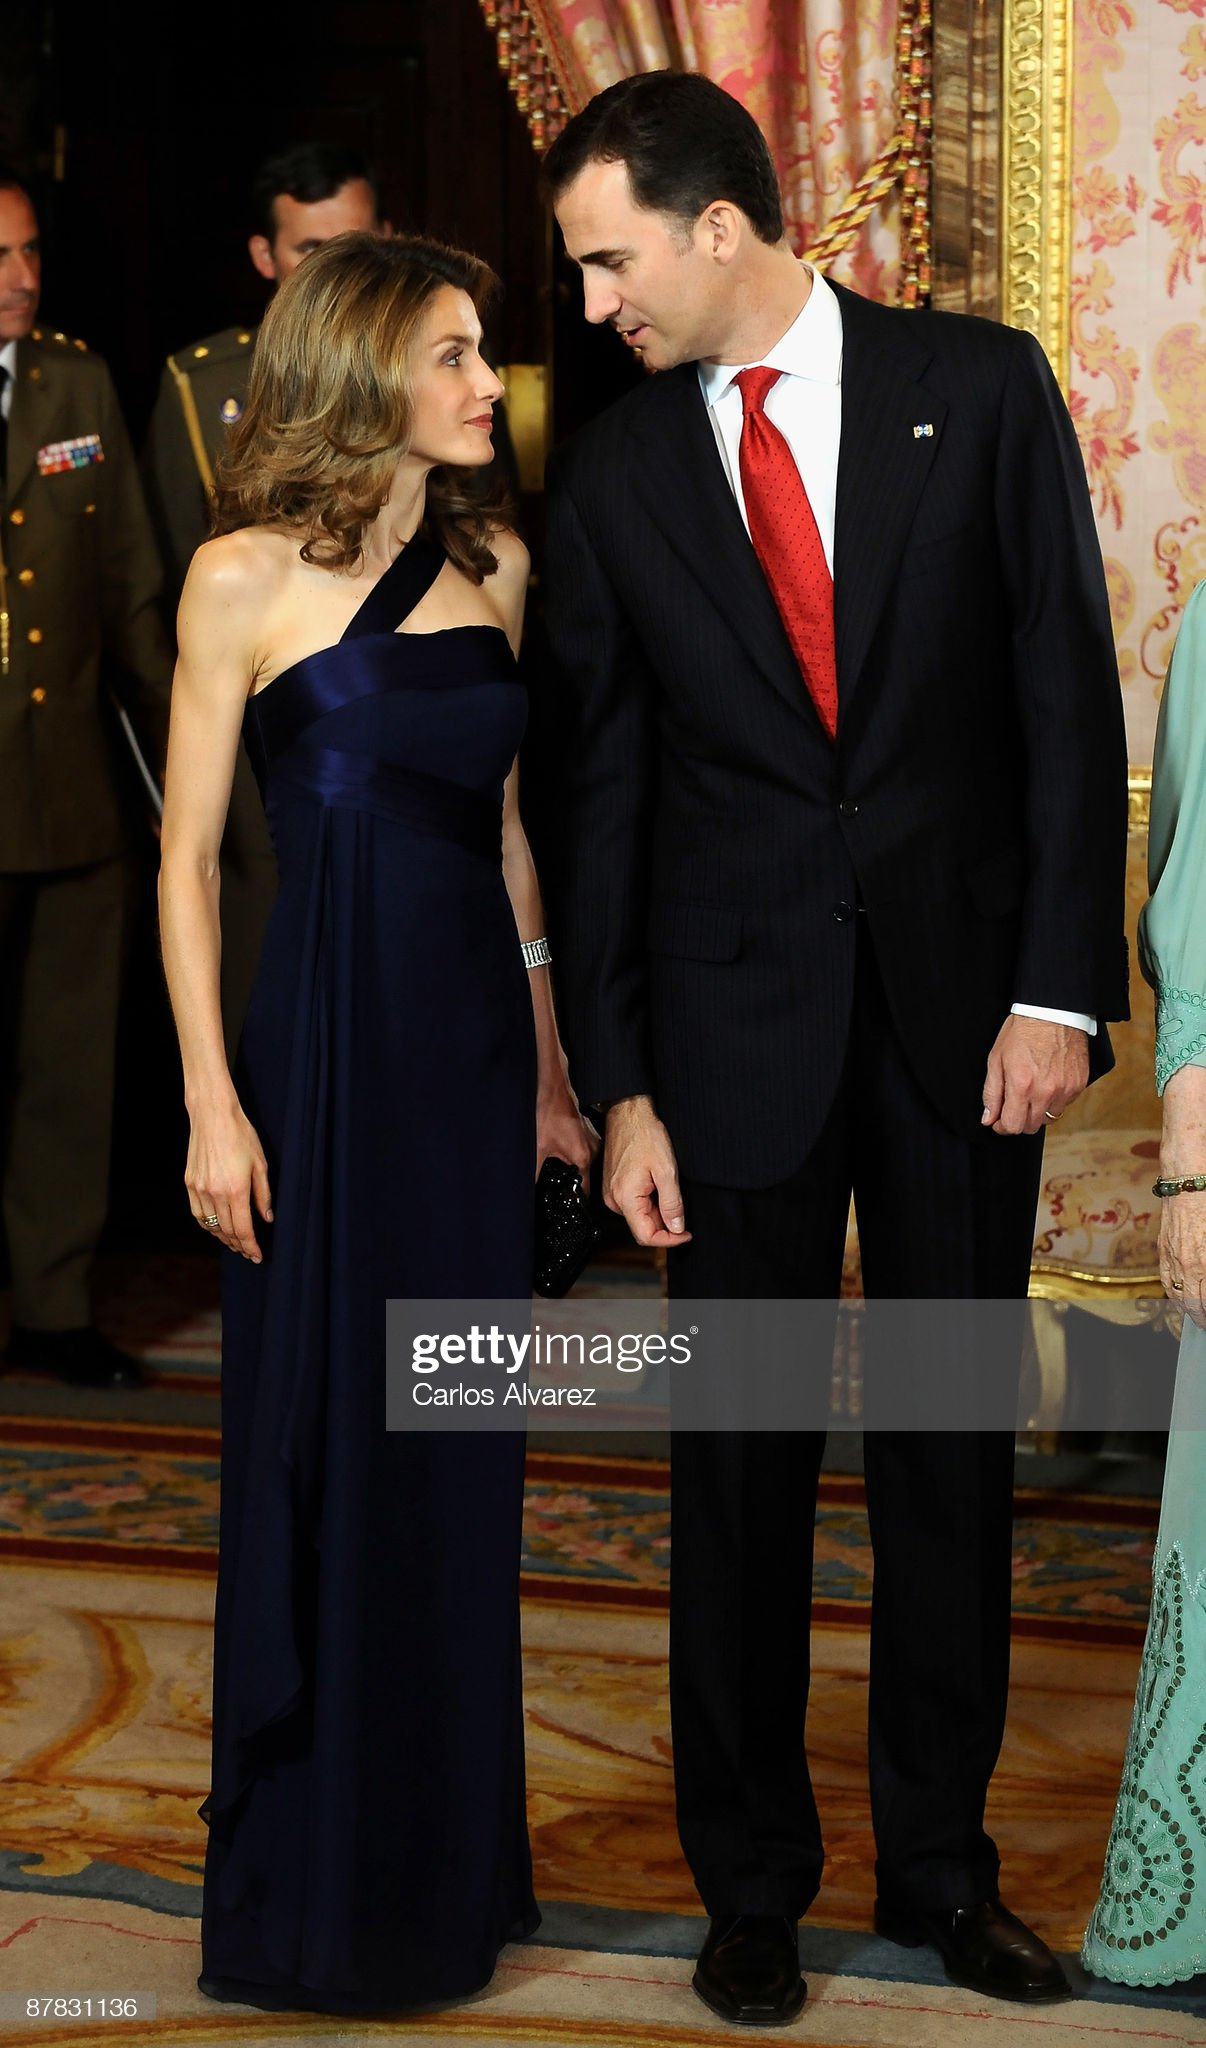 Вечерние наряды Королевы Летиции Spanish Royals Host Gala Dinner Honouring Dominican Republic President : News Photo